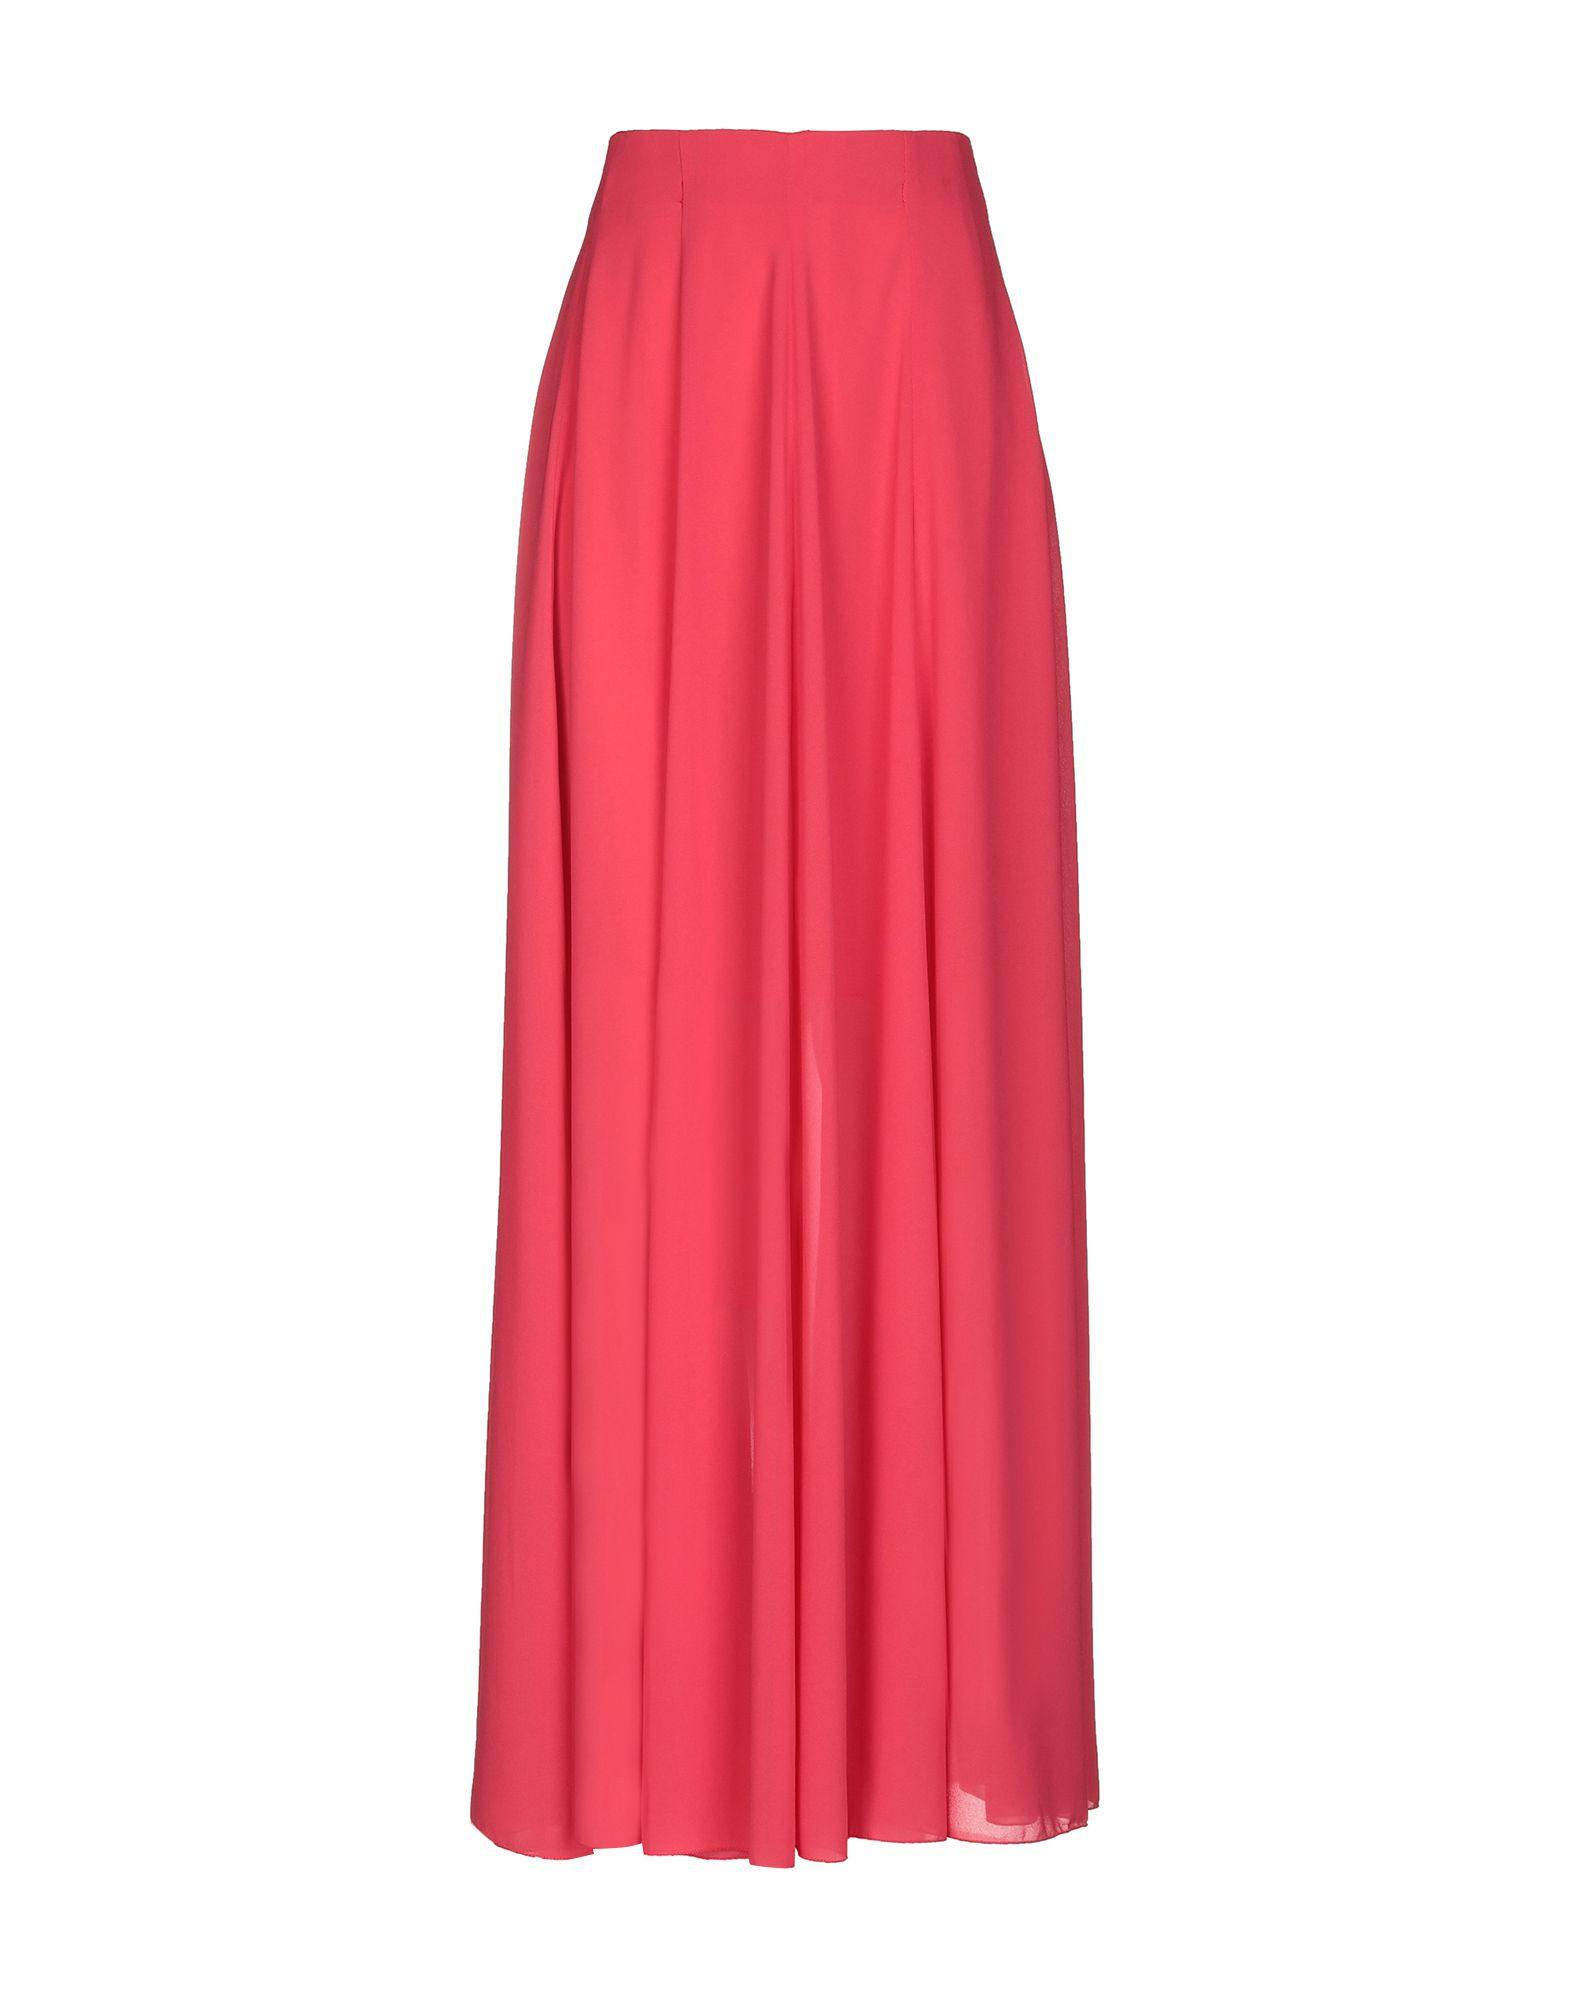 CRISTINA ROCCA Длинная юбка cristina rocca длинная юбка